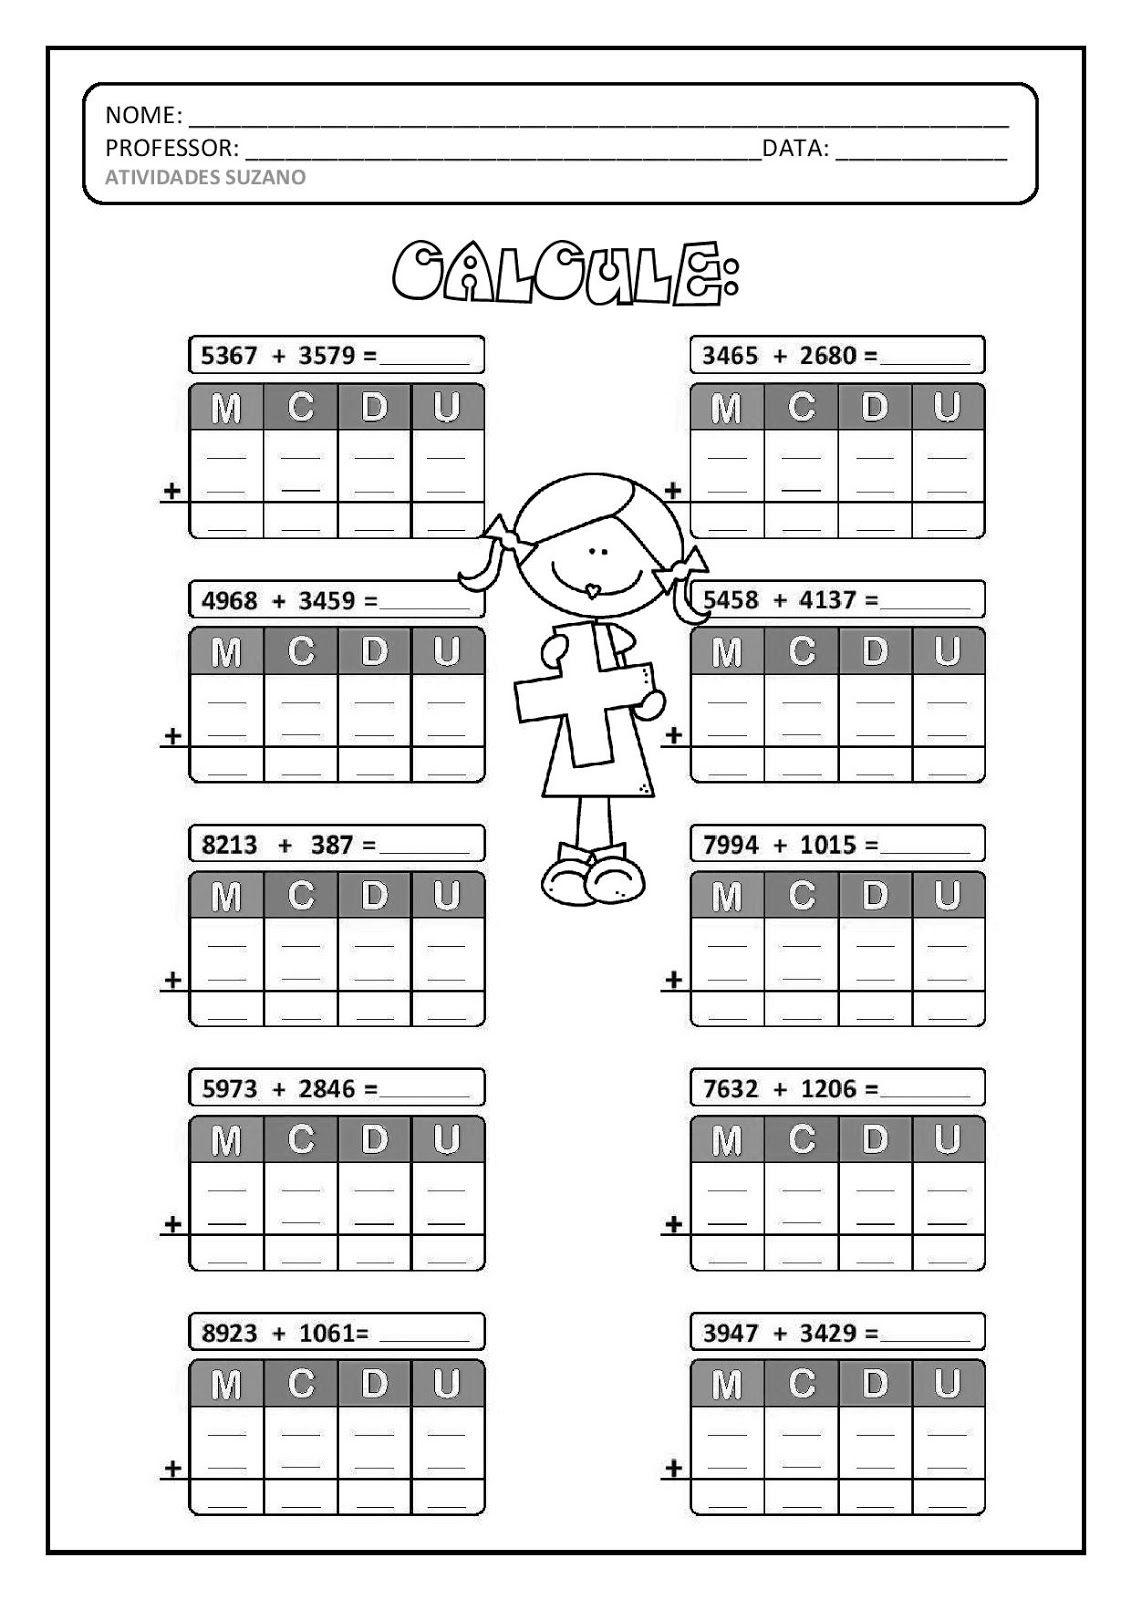 Document-page-001.jpg (1131×1600) | clasa-5 | Pinterest | Aula ...